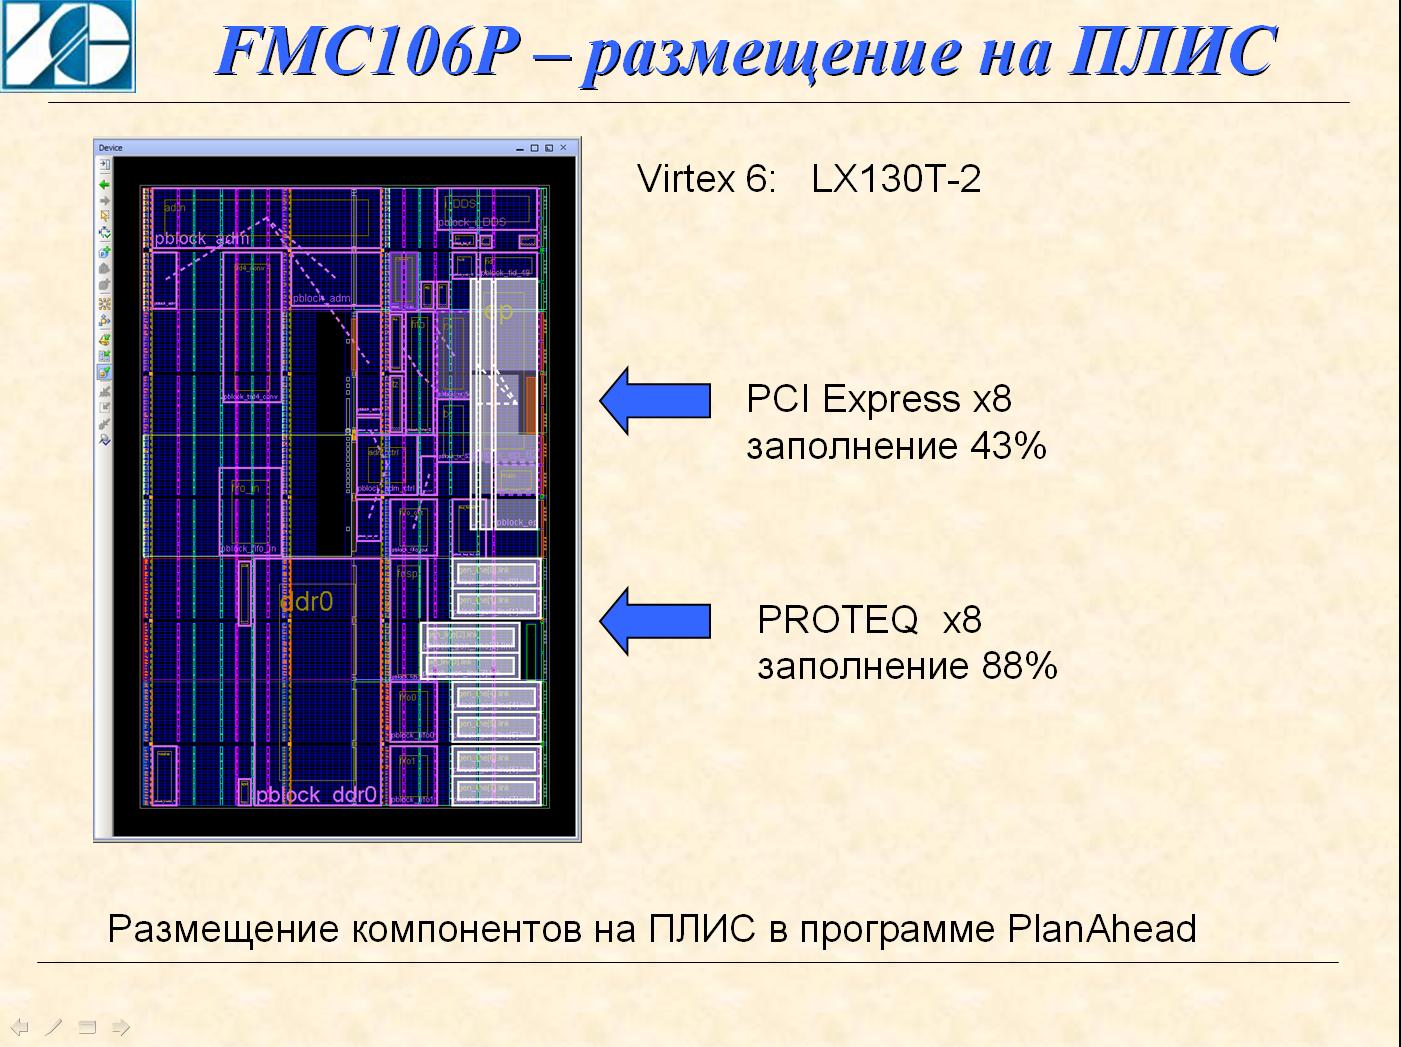 PROTEQ — протокол обмена по мультигигабитным линиям для ПЛИС Xilinx - 2